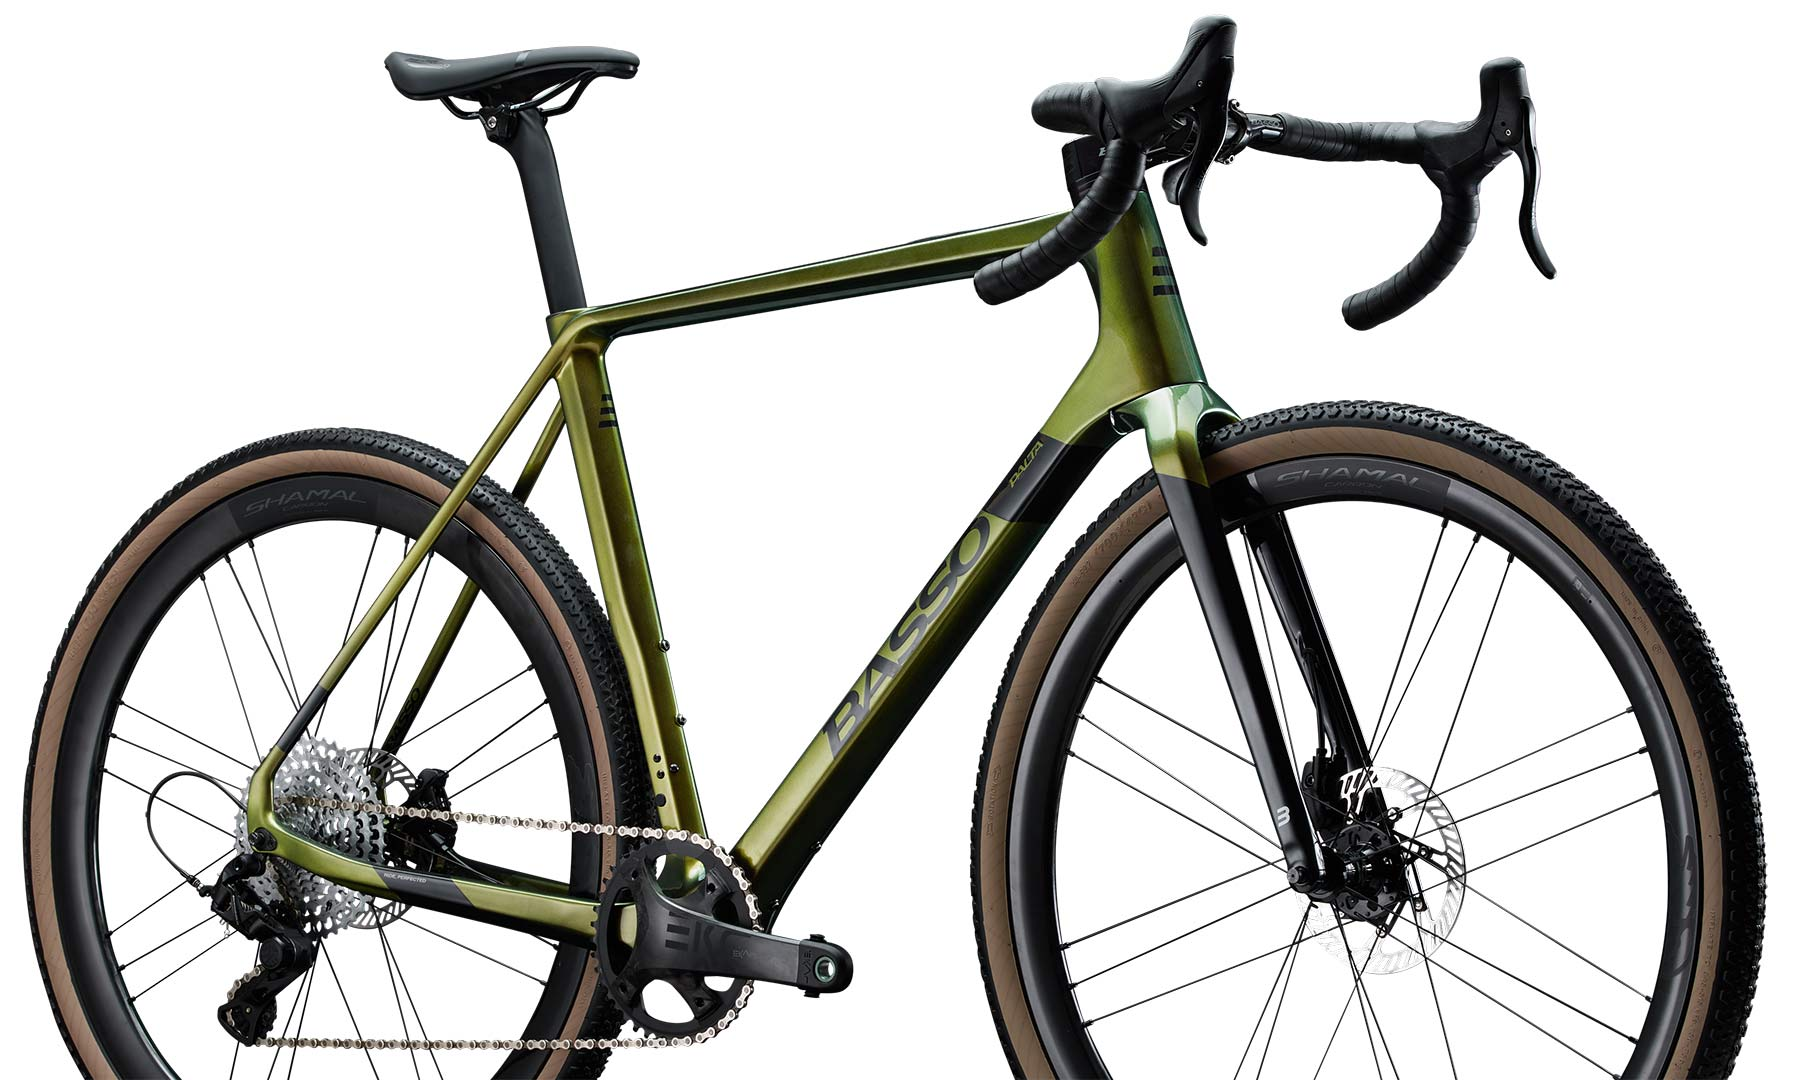 2022 Basso Palta II carbon gravel bike, Campy Ekar